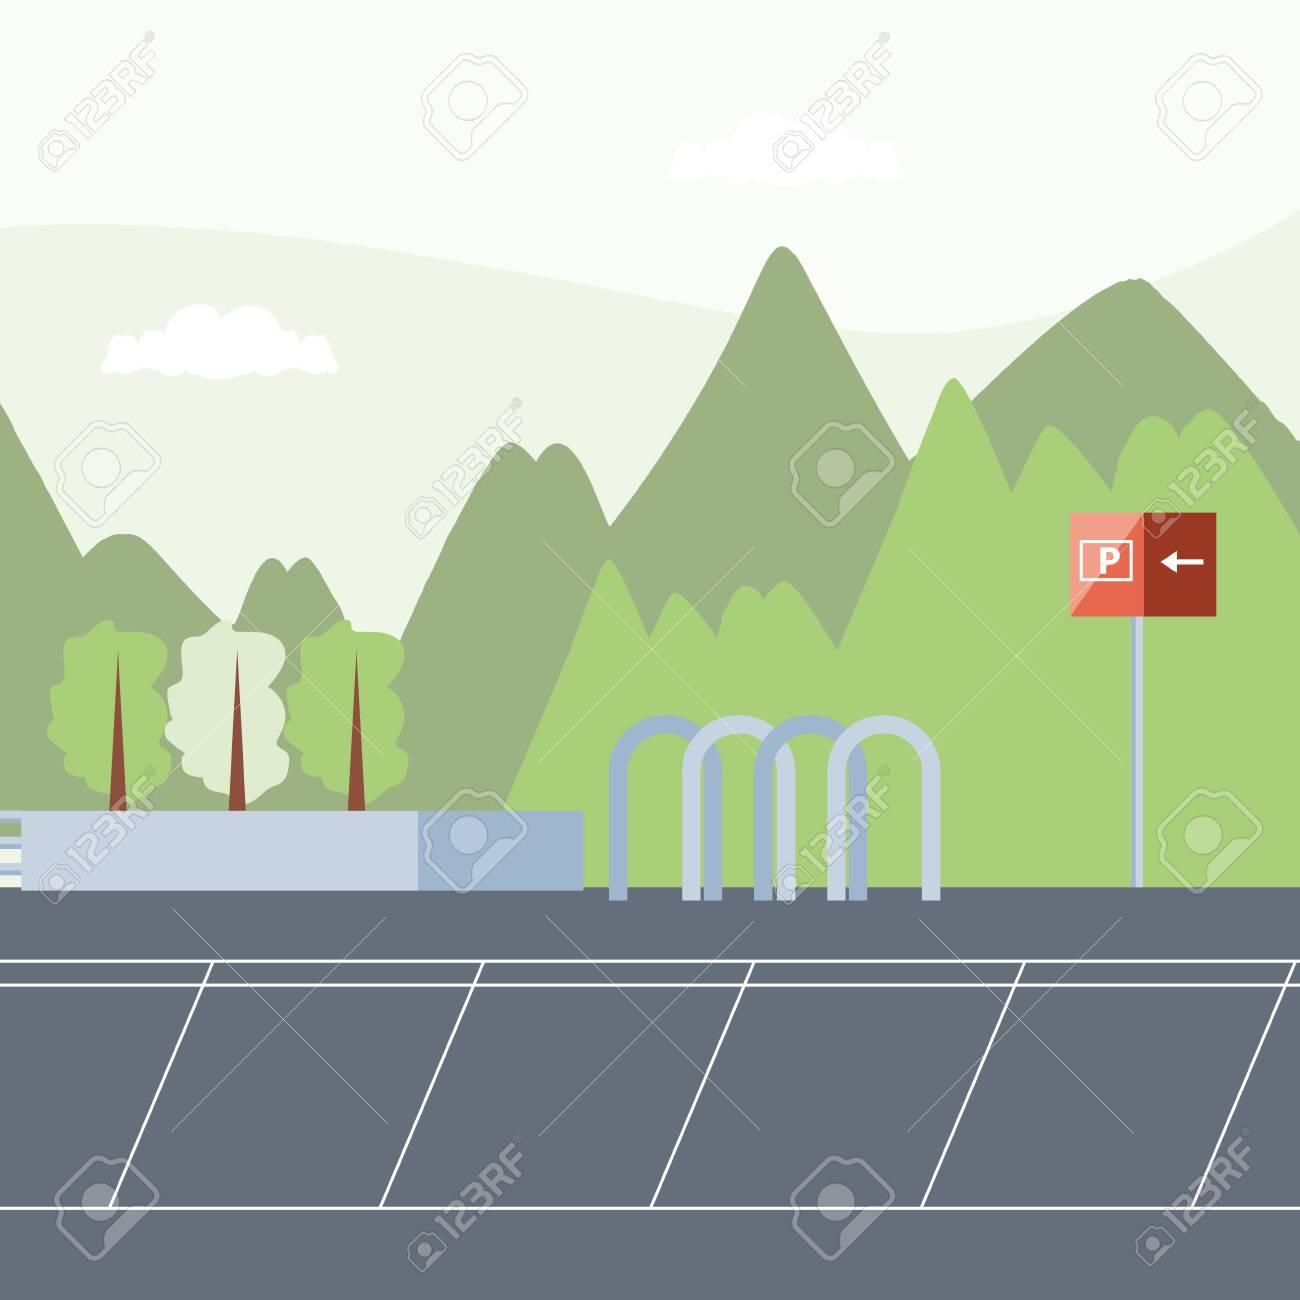 parking zone urban scene icon vector illustration design - 136914826